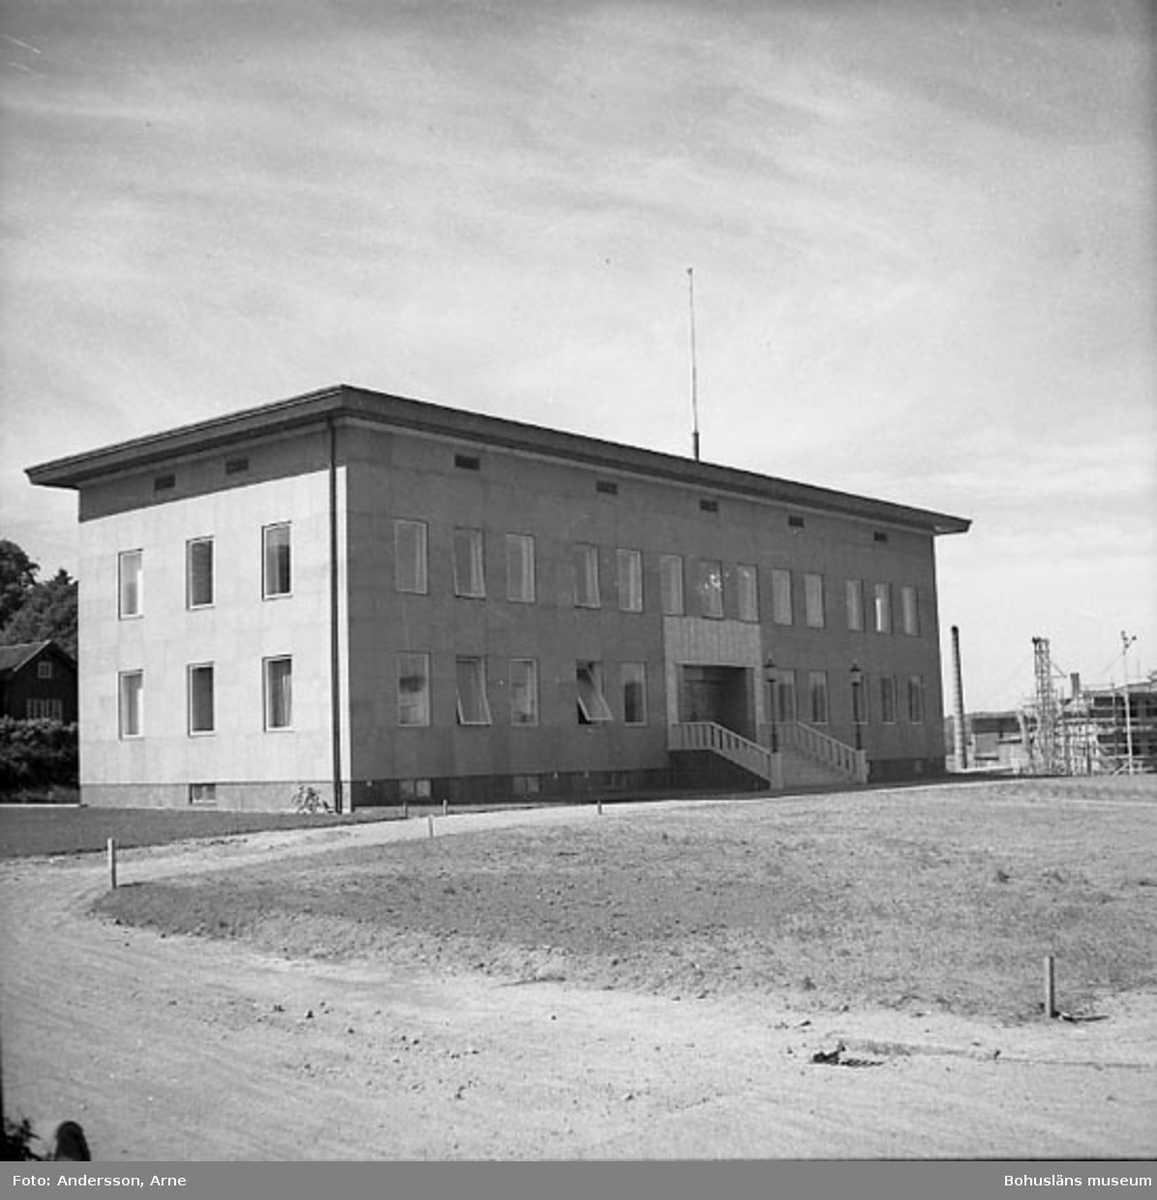 Thordéns rederikontor